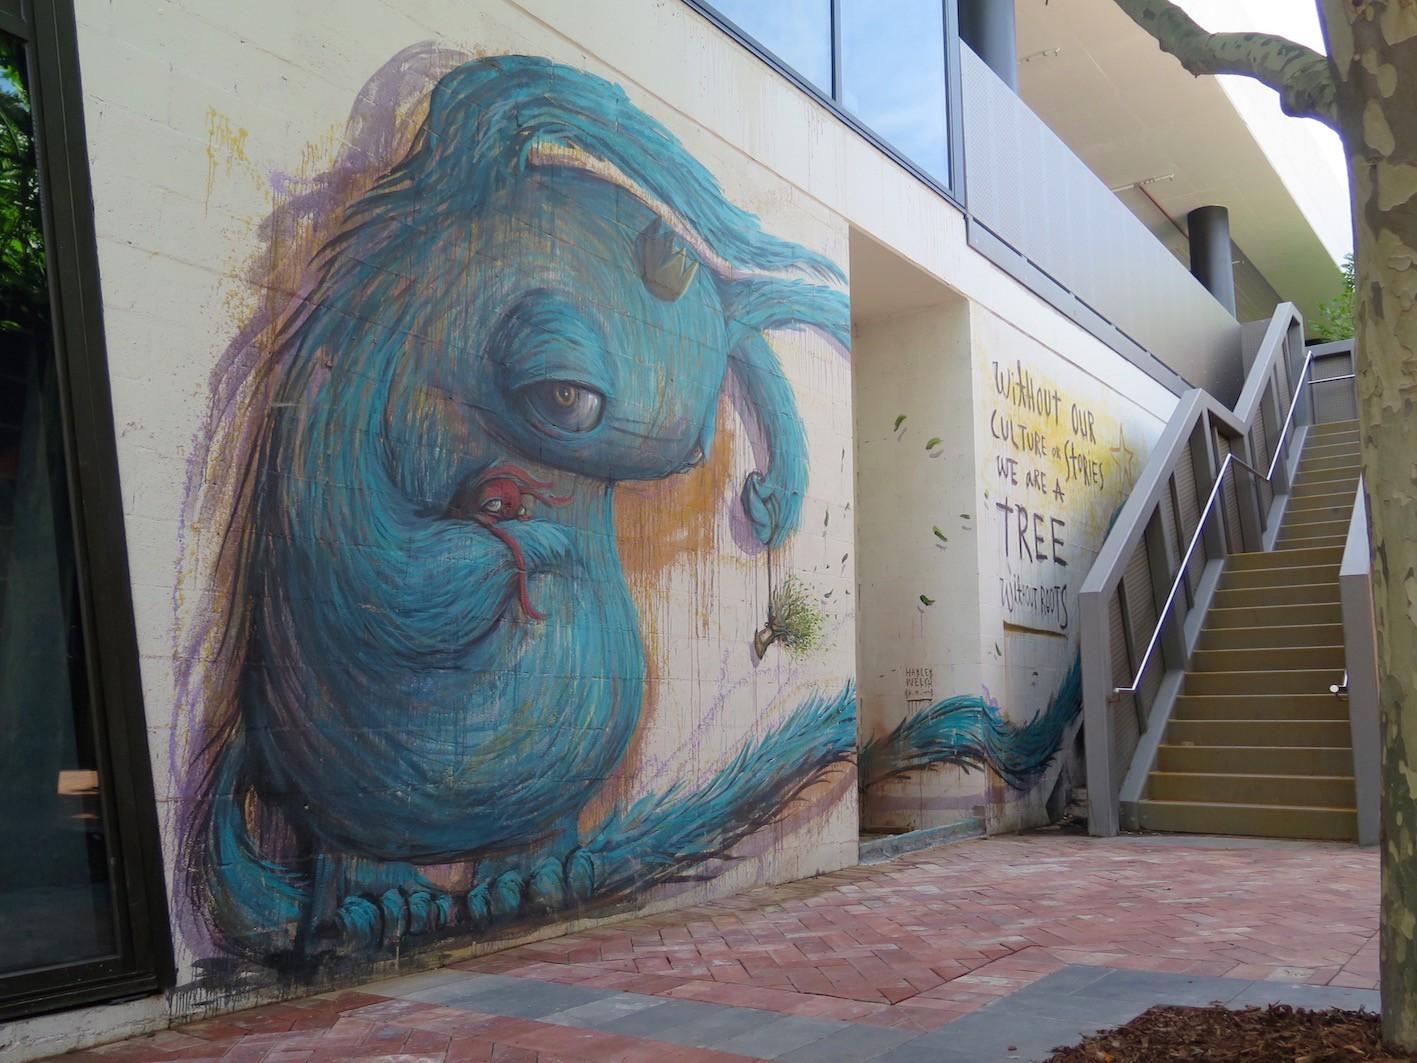 deansunshine_landofsunshine_melbourne_streetart_graffiti_eastland urban art project 13 hayley welsh 2